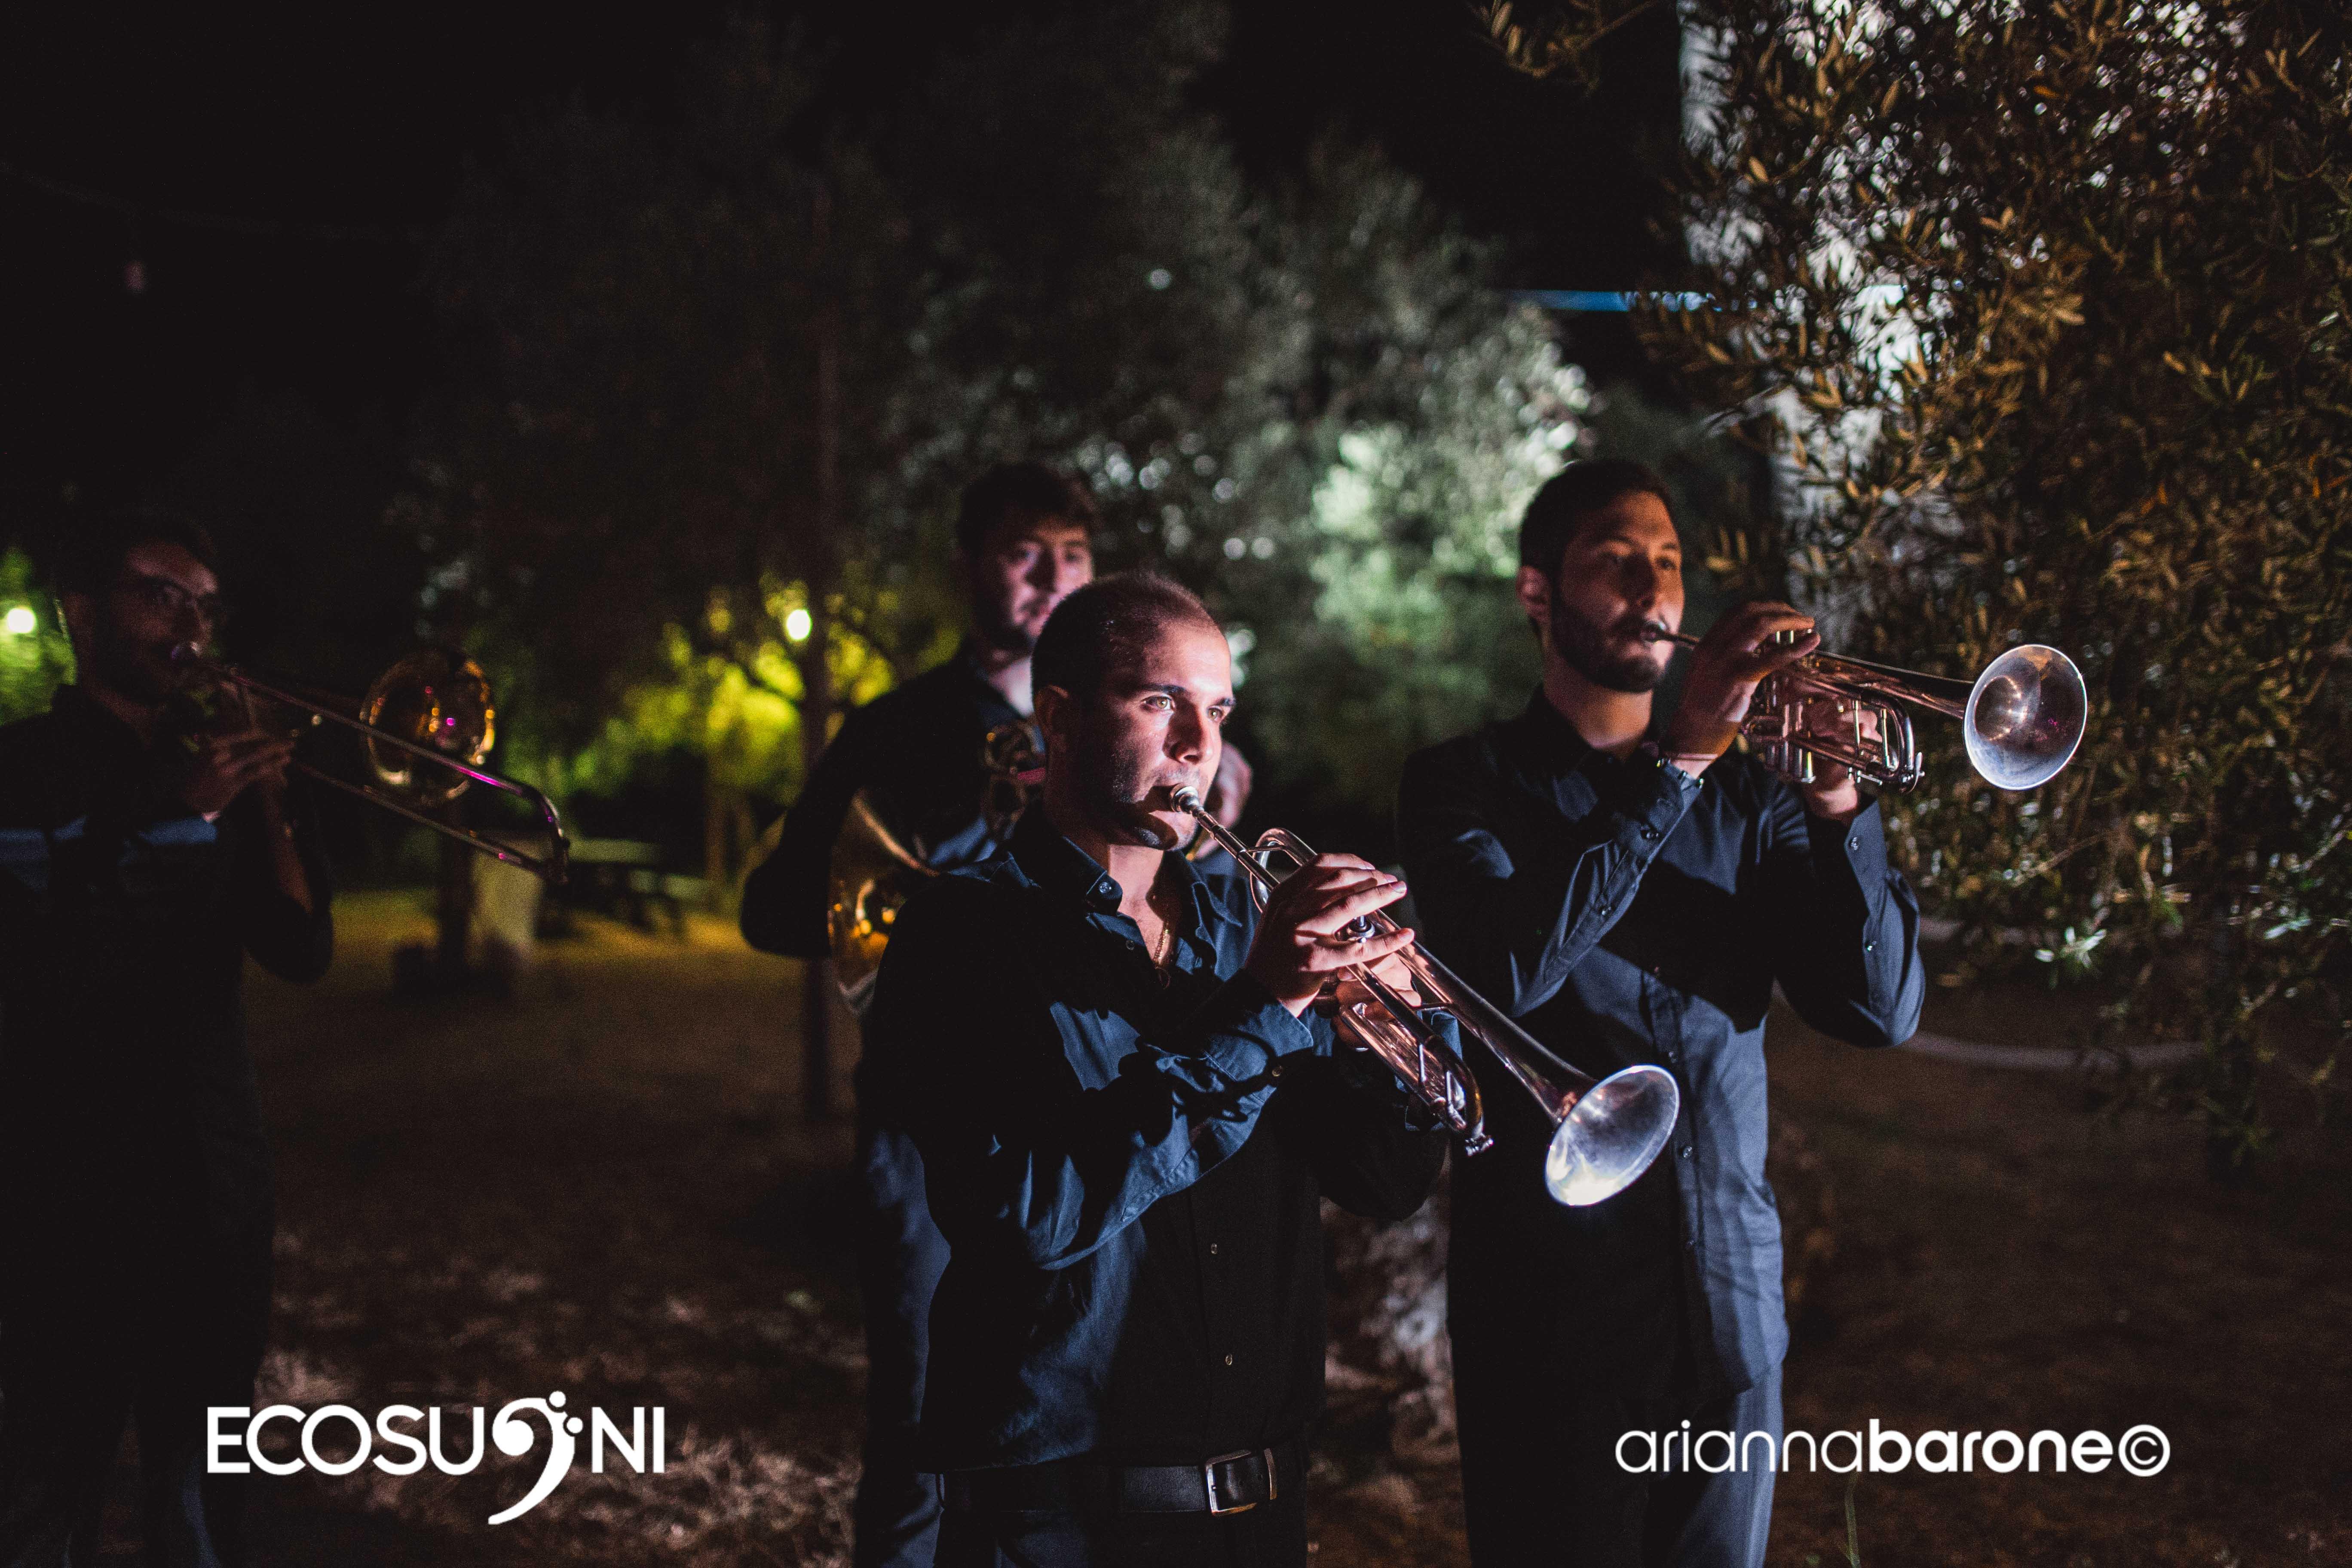 Ecosuoni - Terracina 2019 - 12